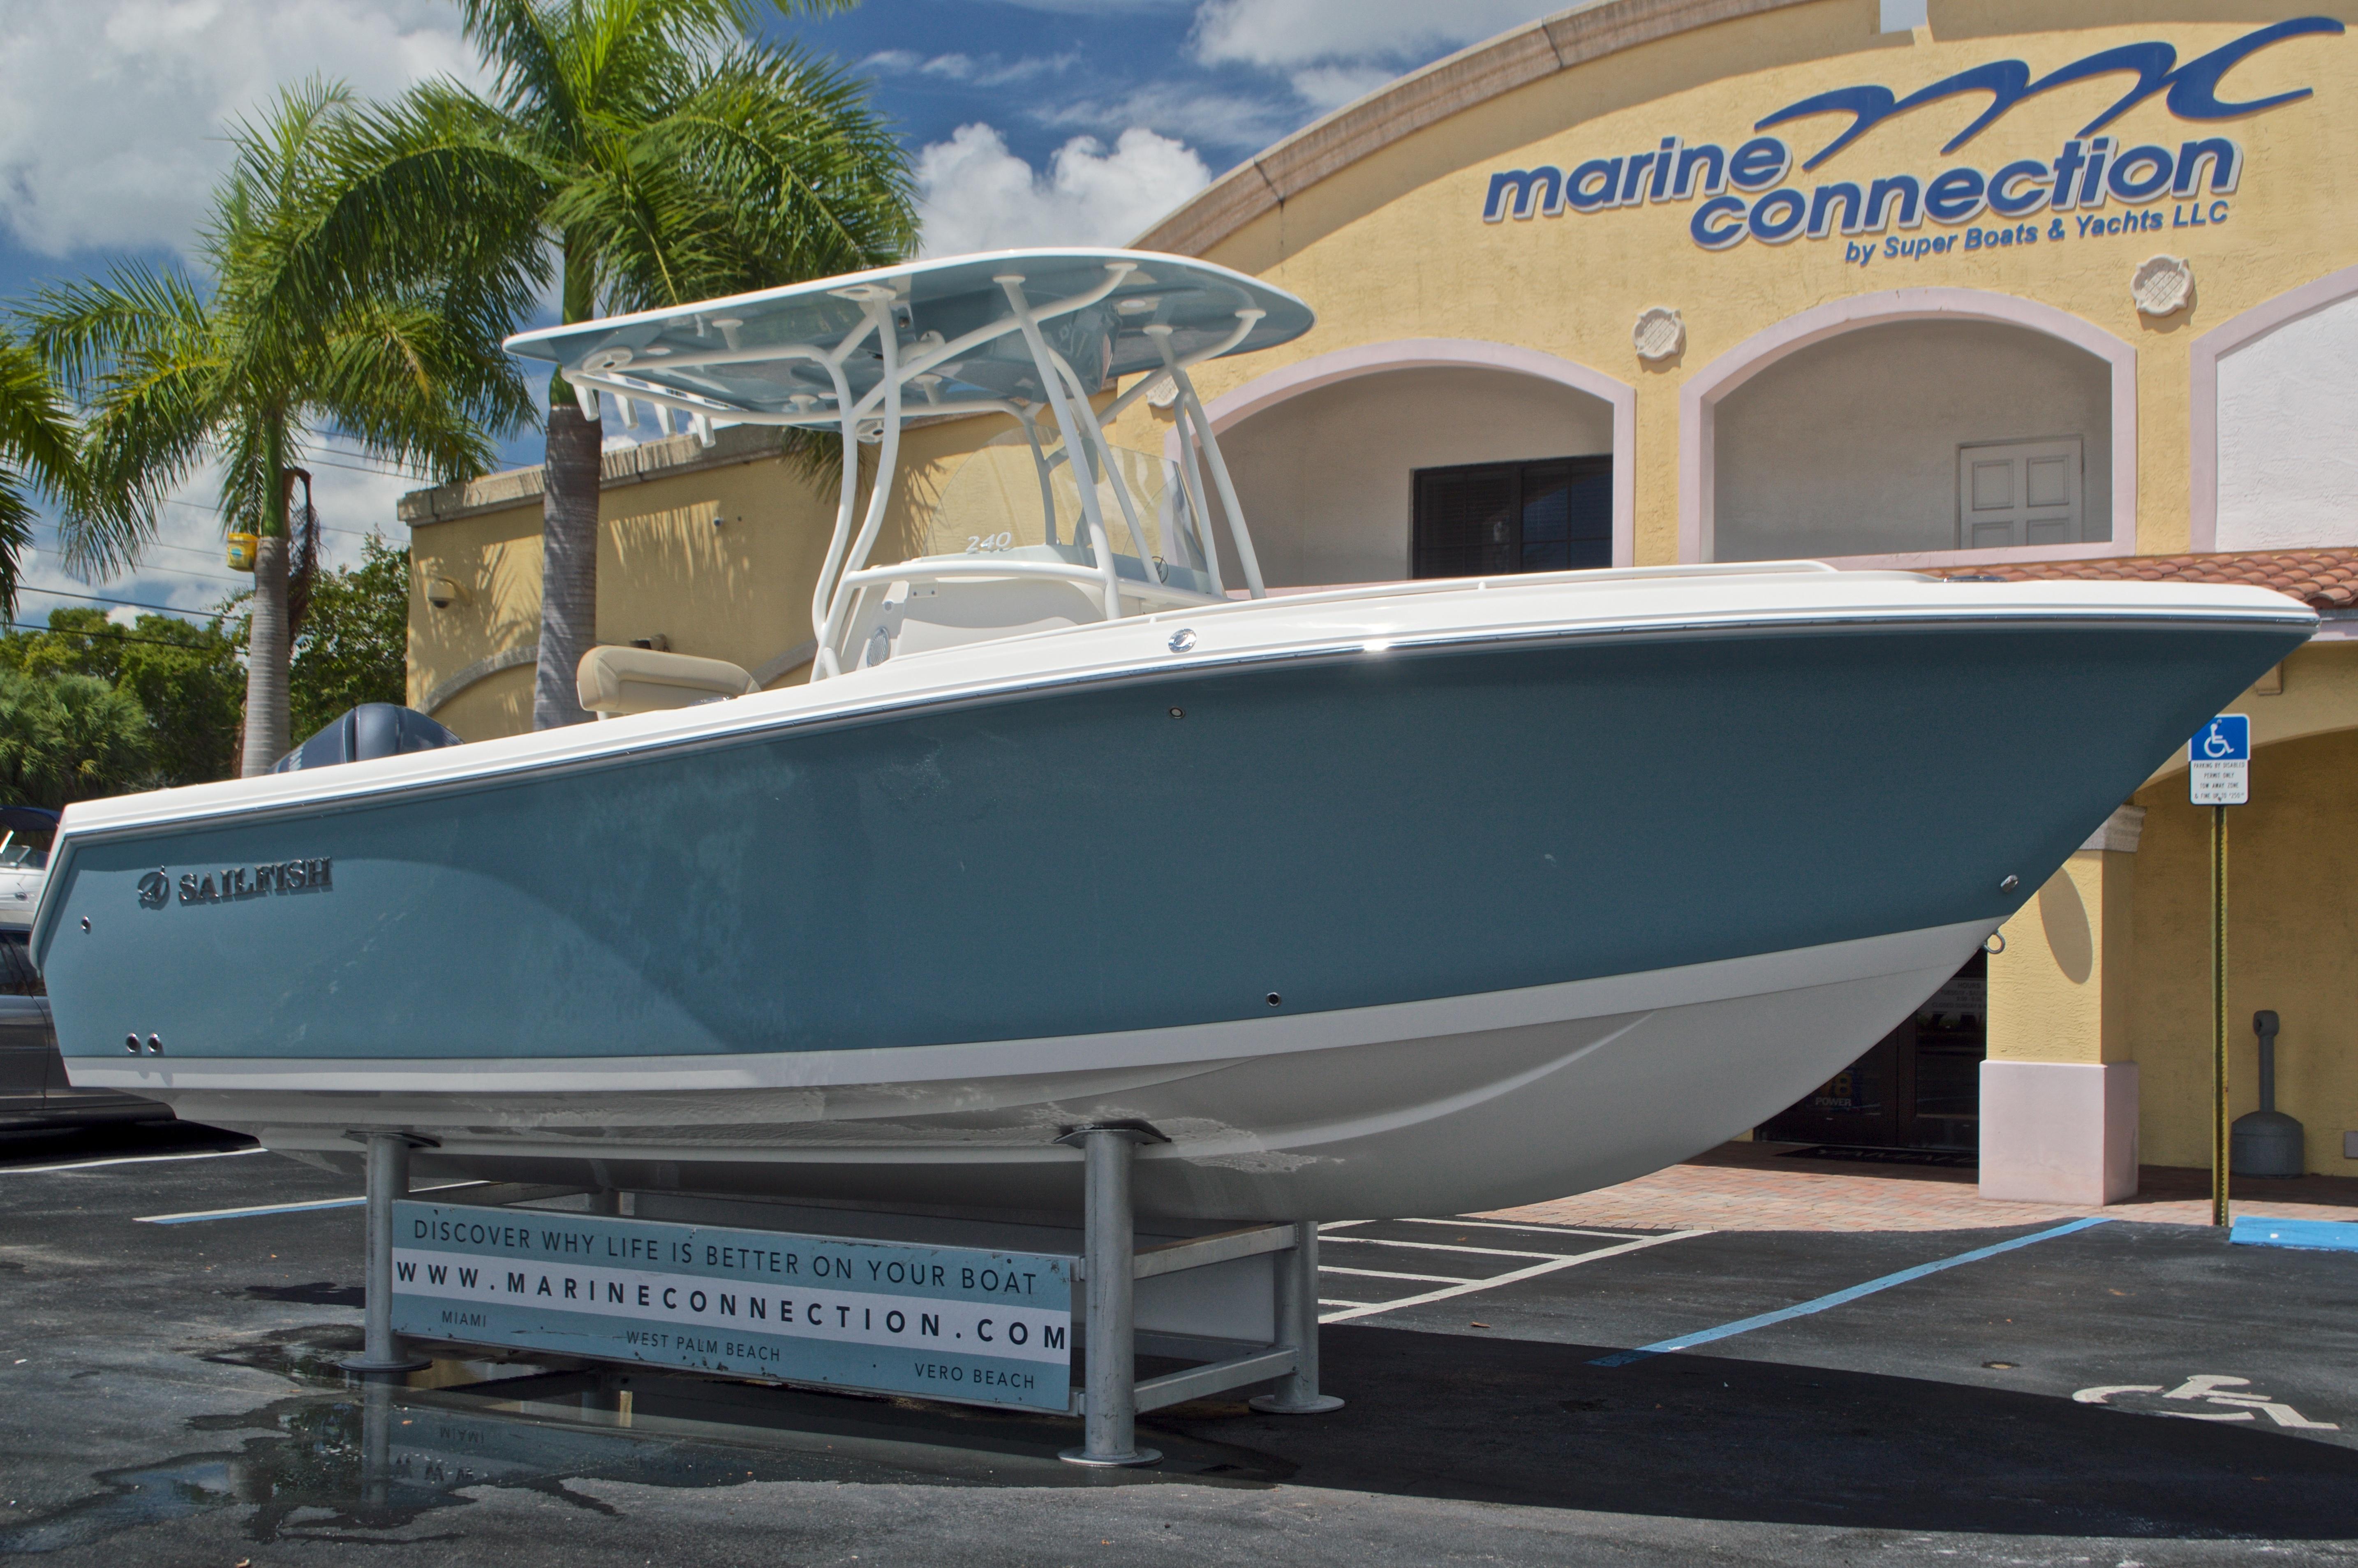 Thumbnail 1 for New 2017 Sailfish 240 CC Center Console boat for sale in Miami, FL